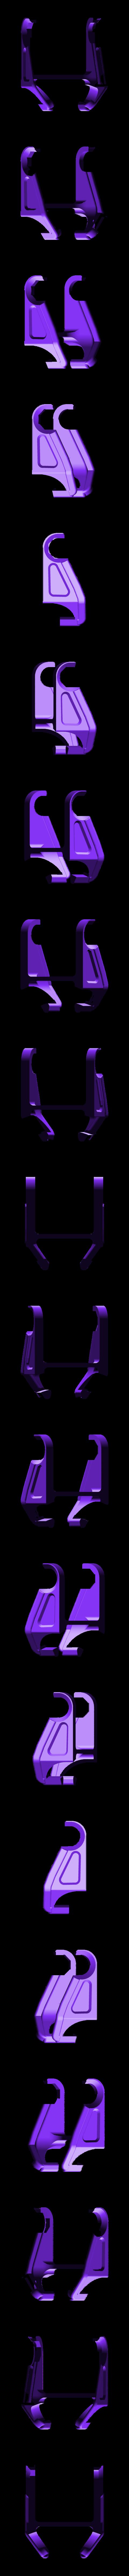 tow-support.stl Download free STL file Tow Walker • 3D print model, ferjerez3d